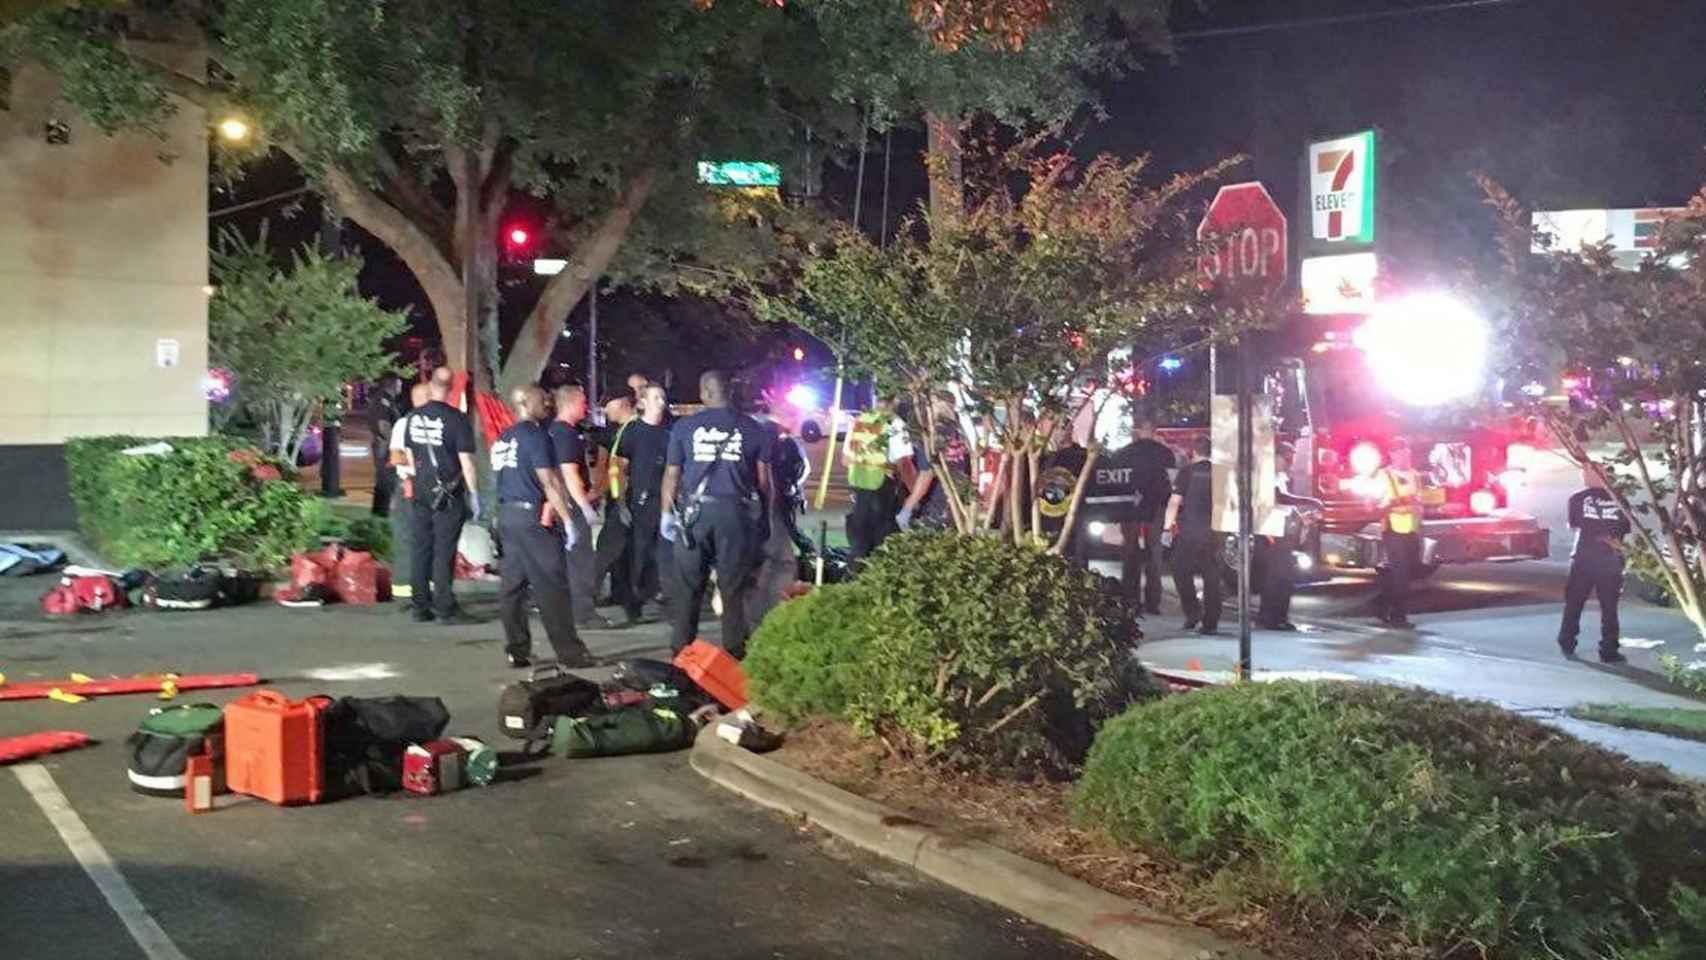 Exteriores del club Pulse, tras el tiroteo.